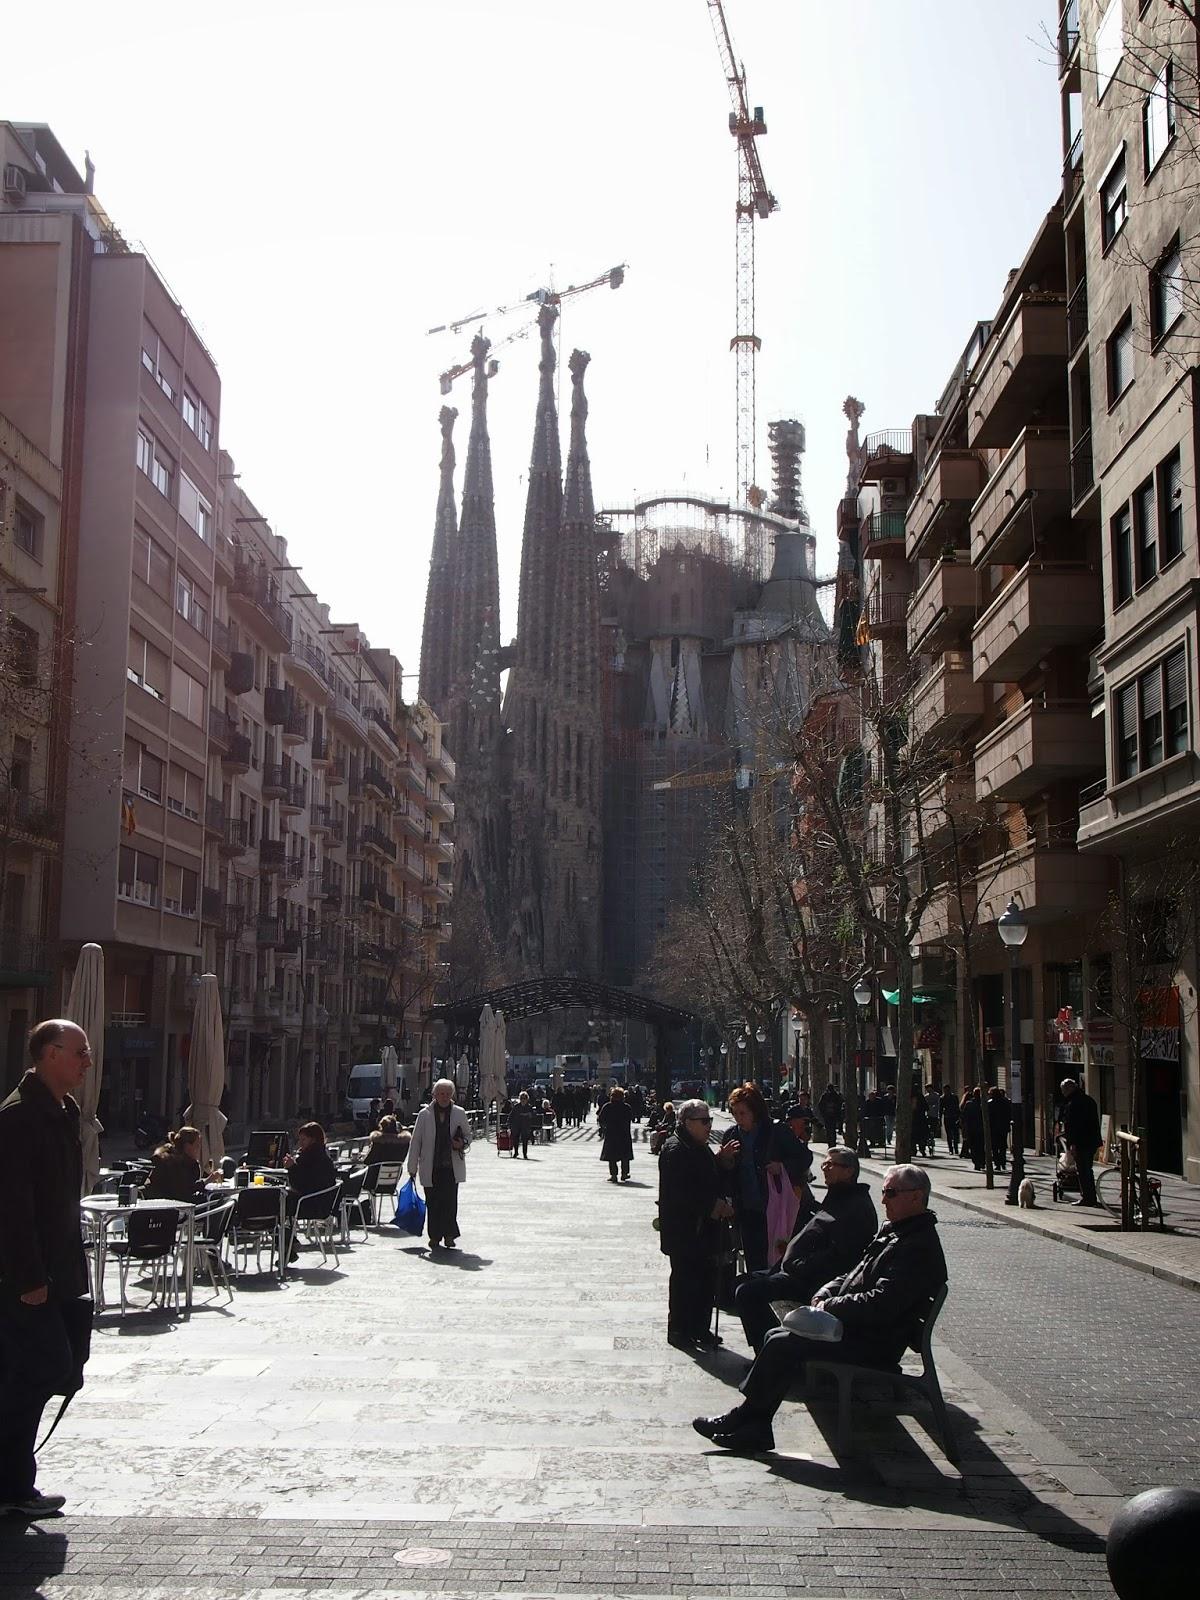 Walking away from La Sagrada Familia